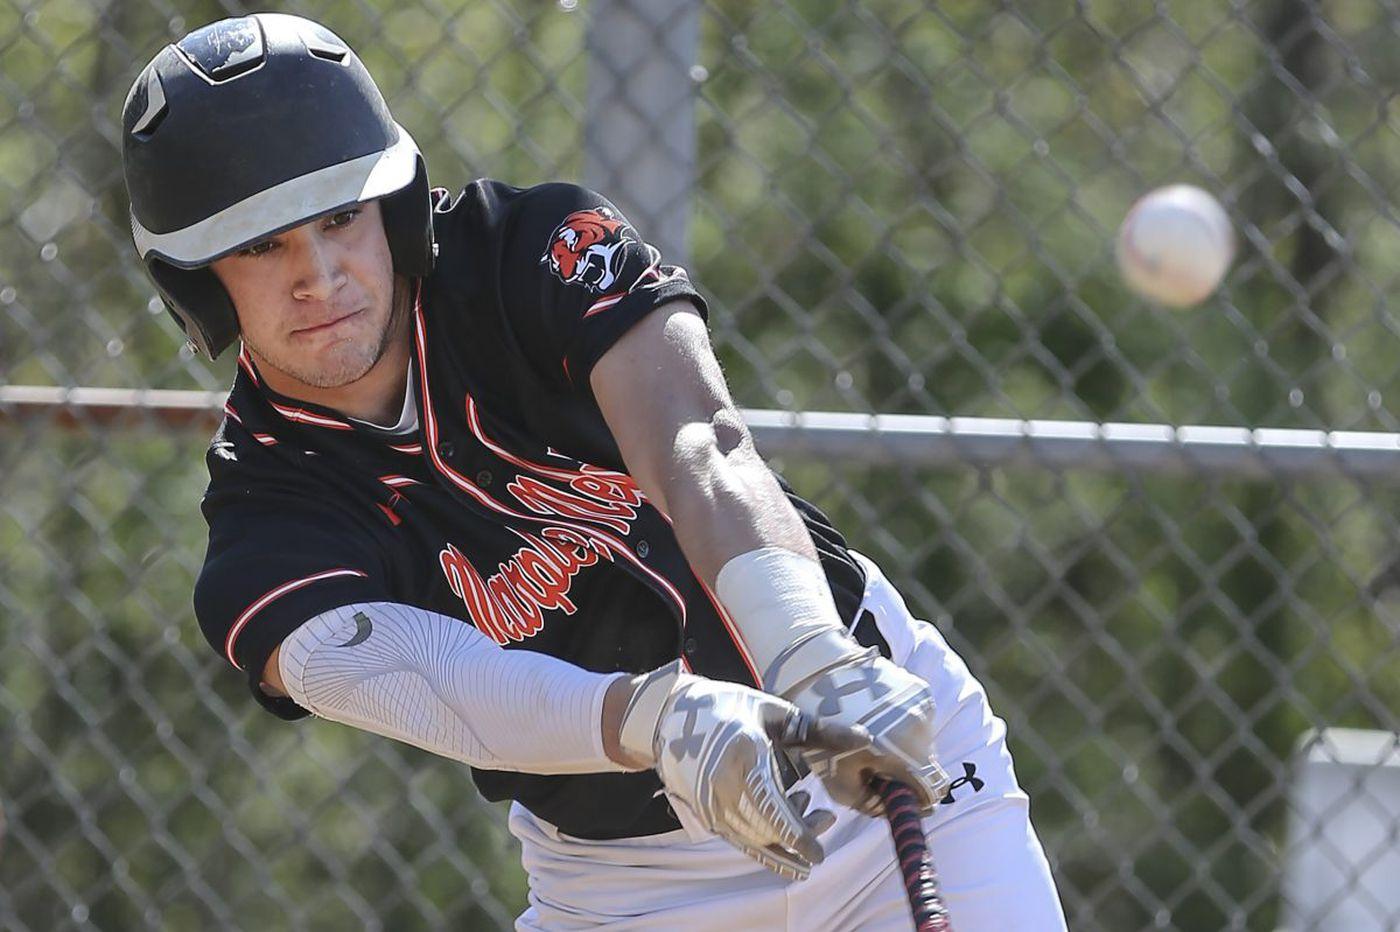 Wednesday's Pa. roundup: Conestoga baseball shocks top-seeded North Penn